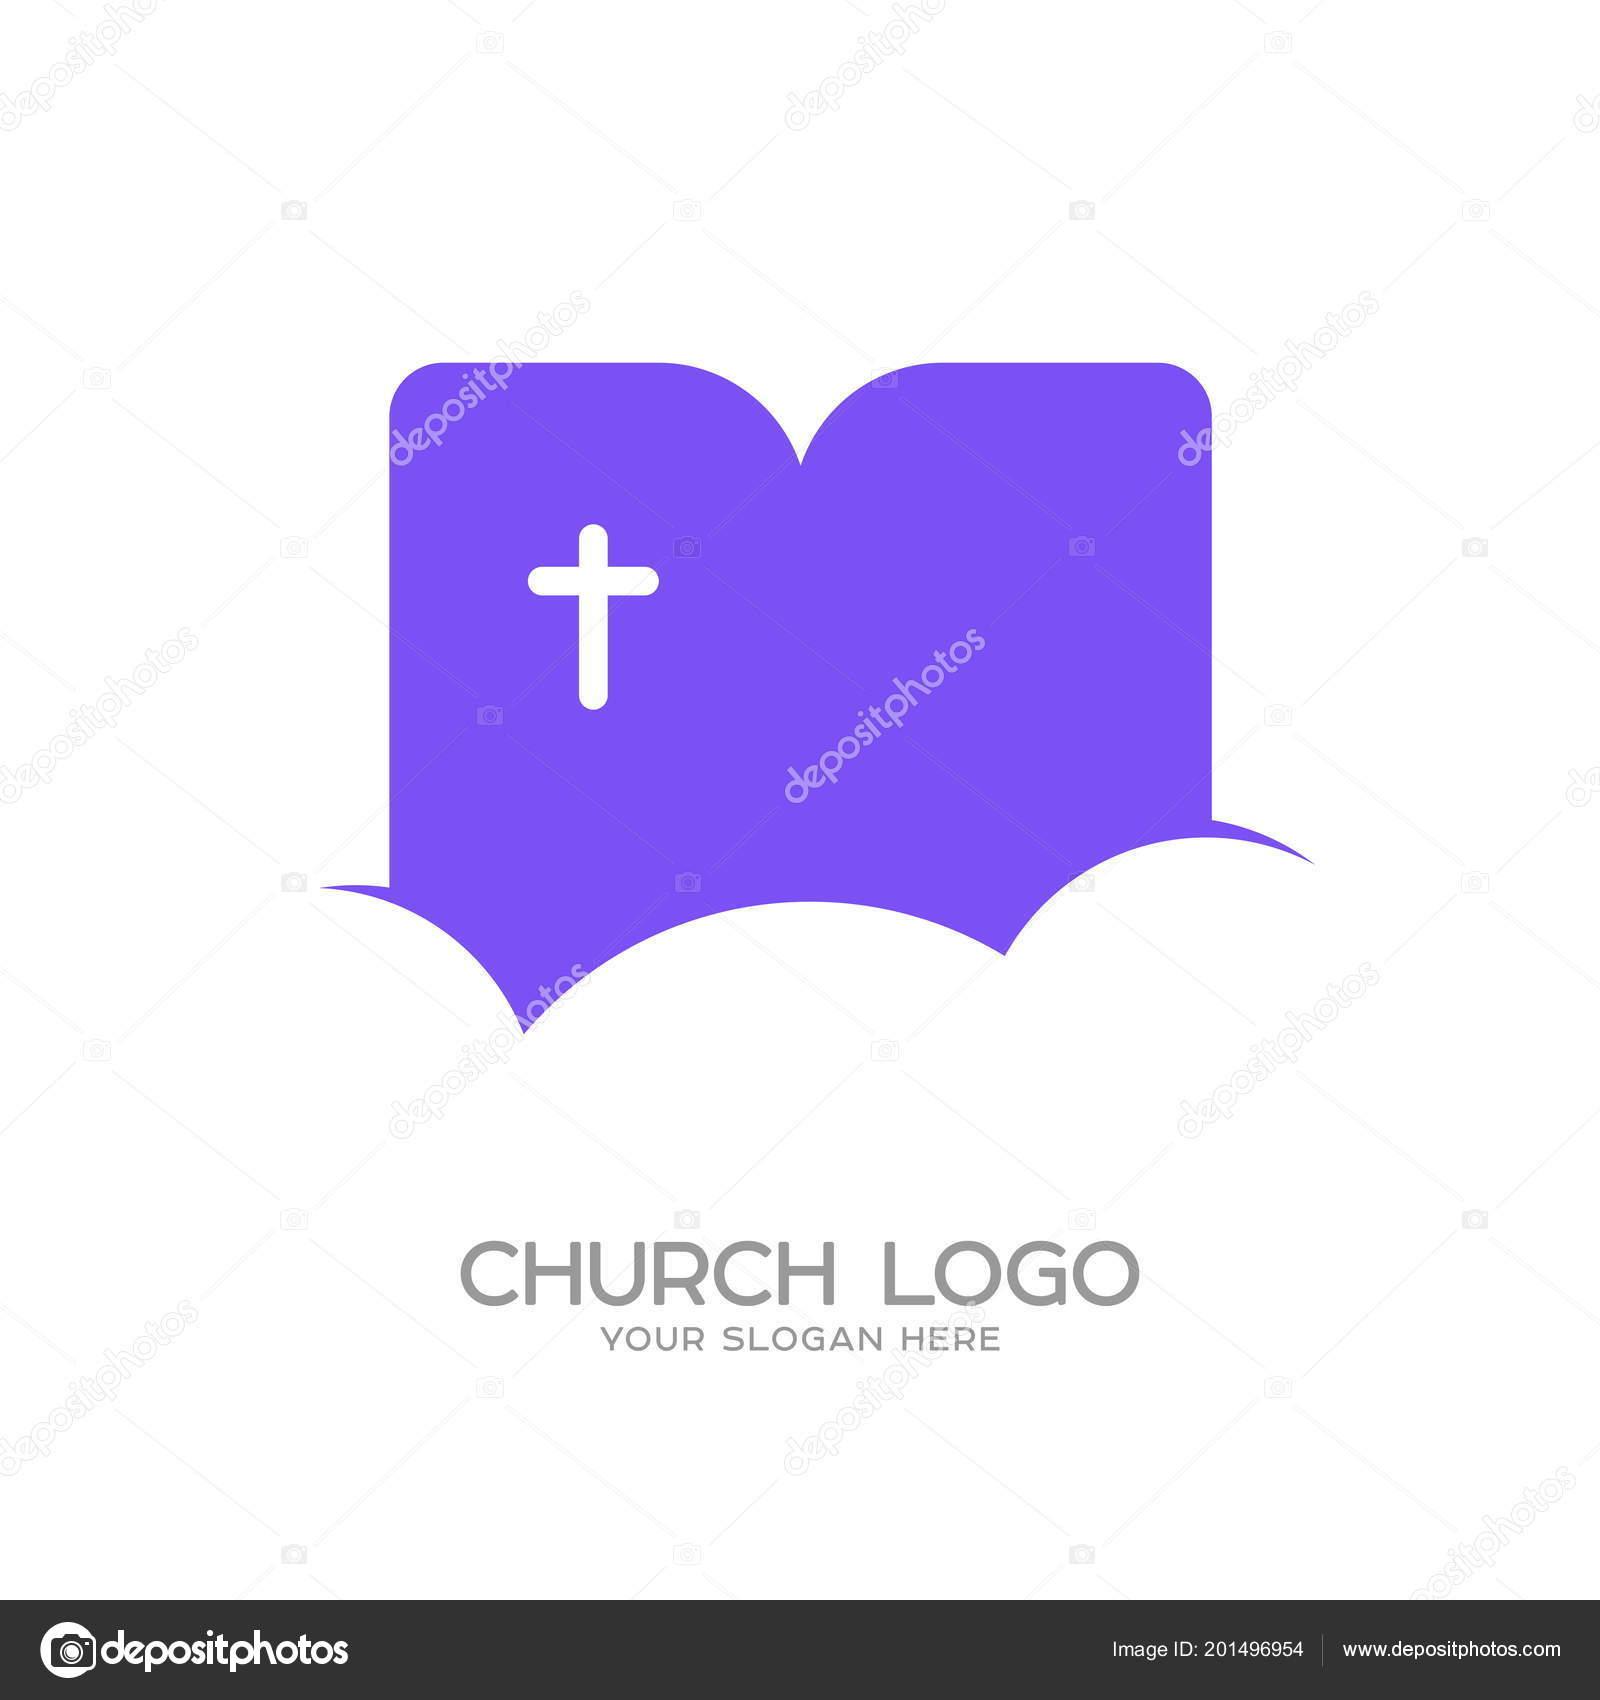 Church Logo Christian Symbols Cross Jesus Christ Background Cloud